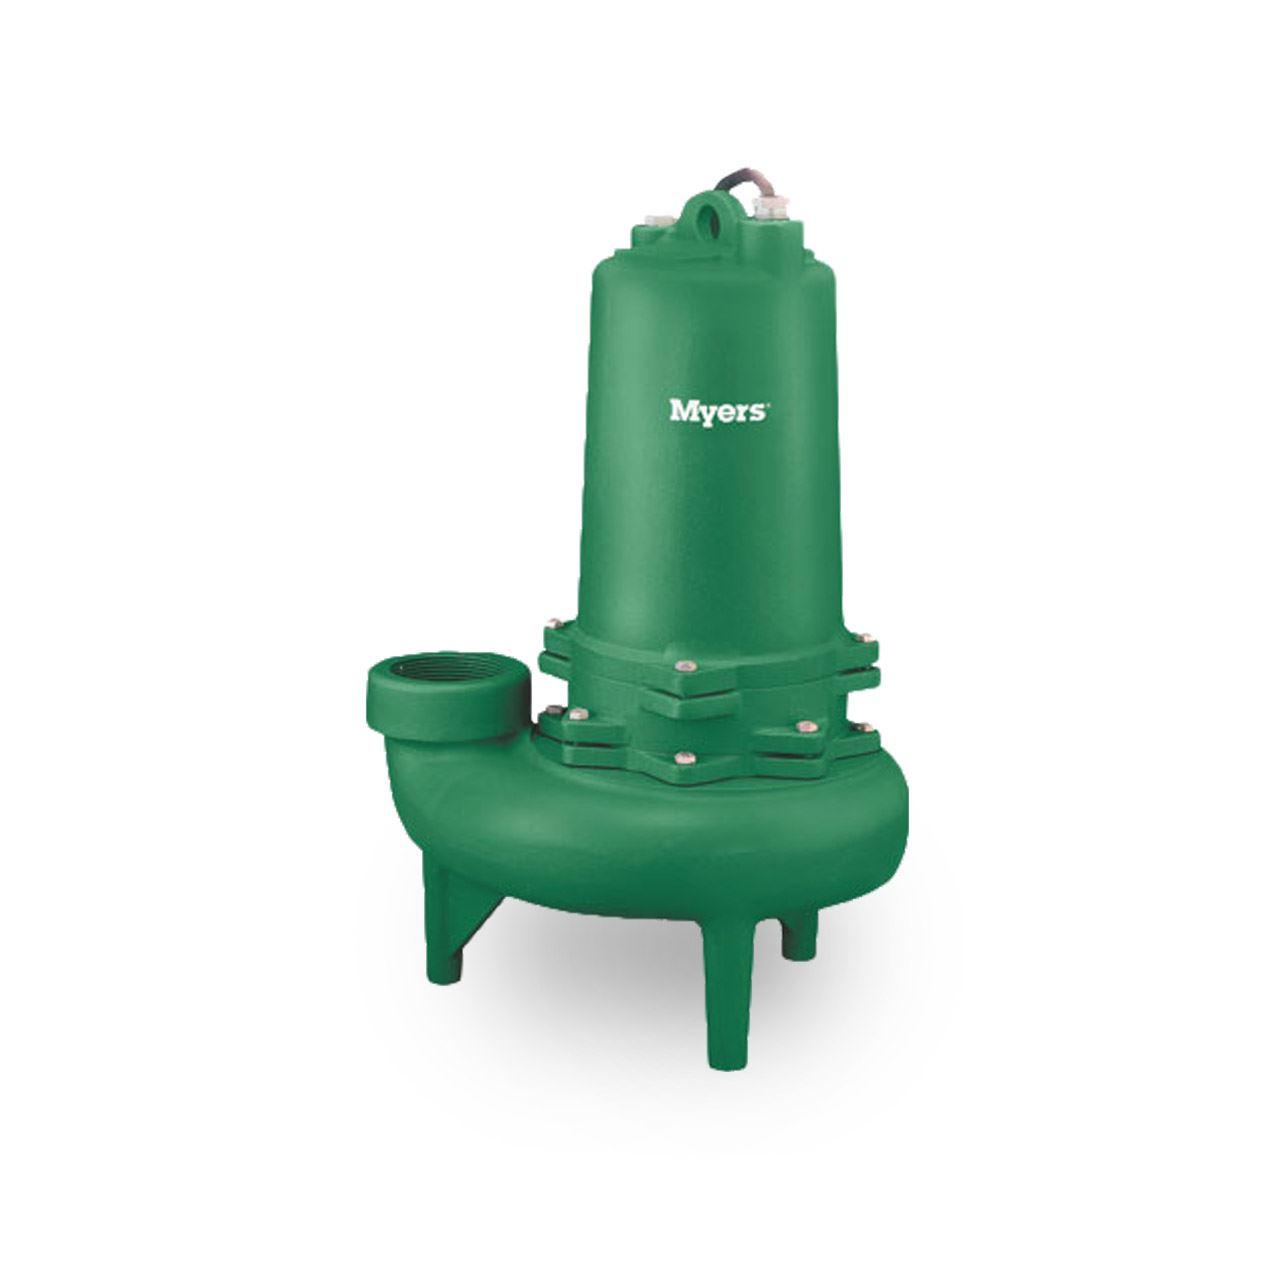 myers myers 3mw30m4 23 sewage pump 3 0 hp 230v 3ph 1750 rpm 20 rh rcworst com Meyer E-47 Plow Wiring Diagram 3-Way Switch Wiring Diagram